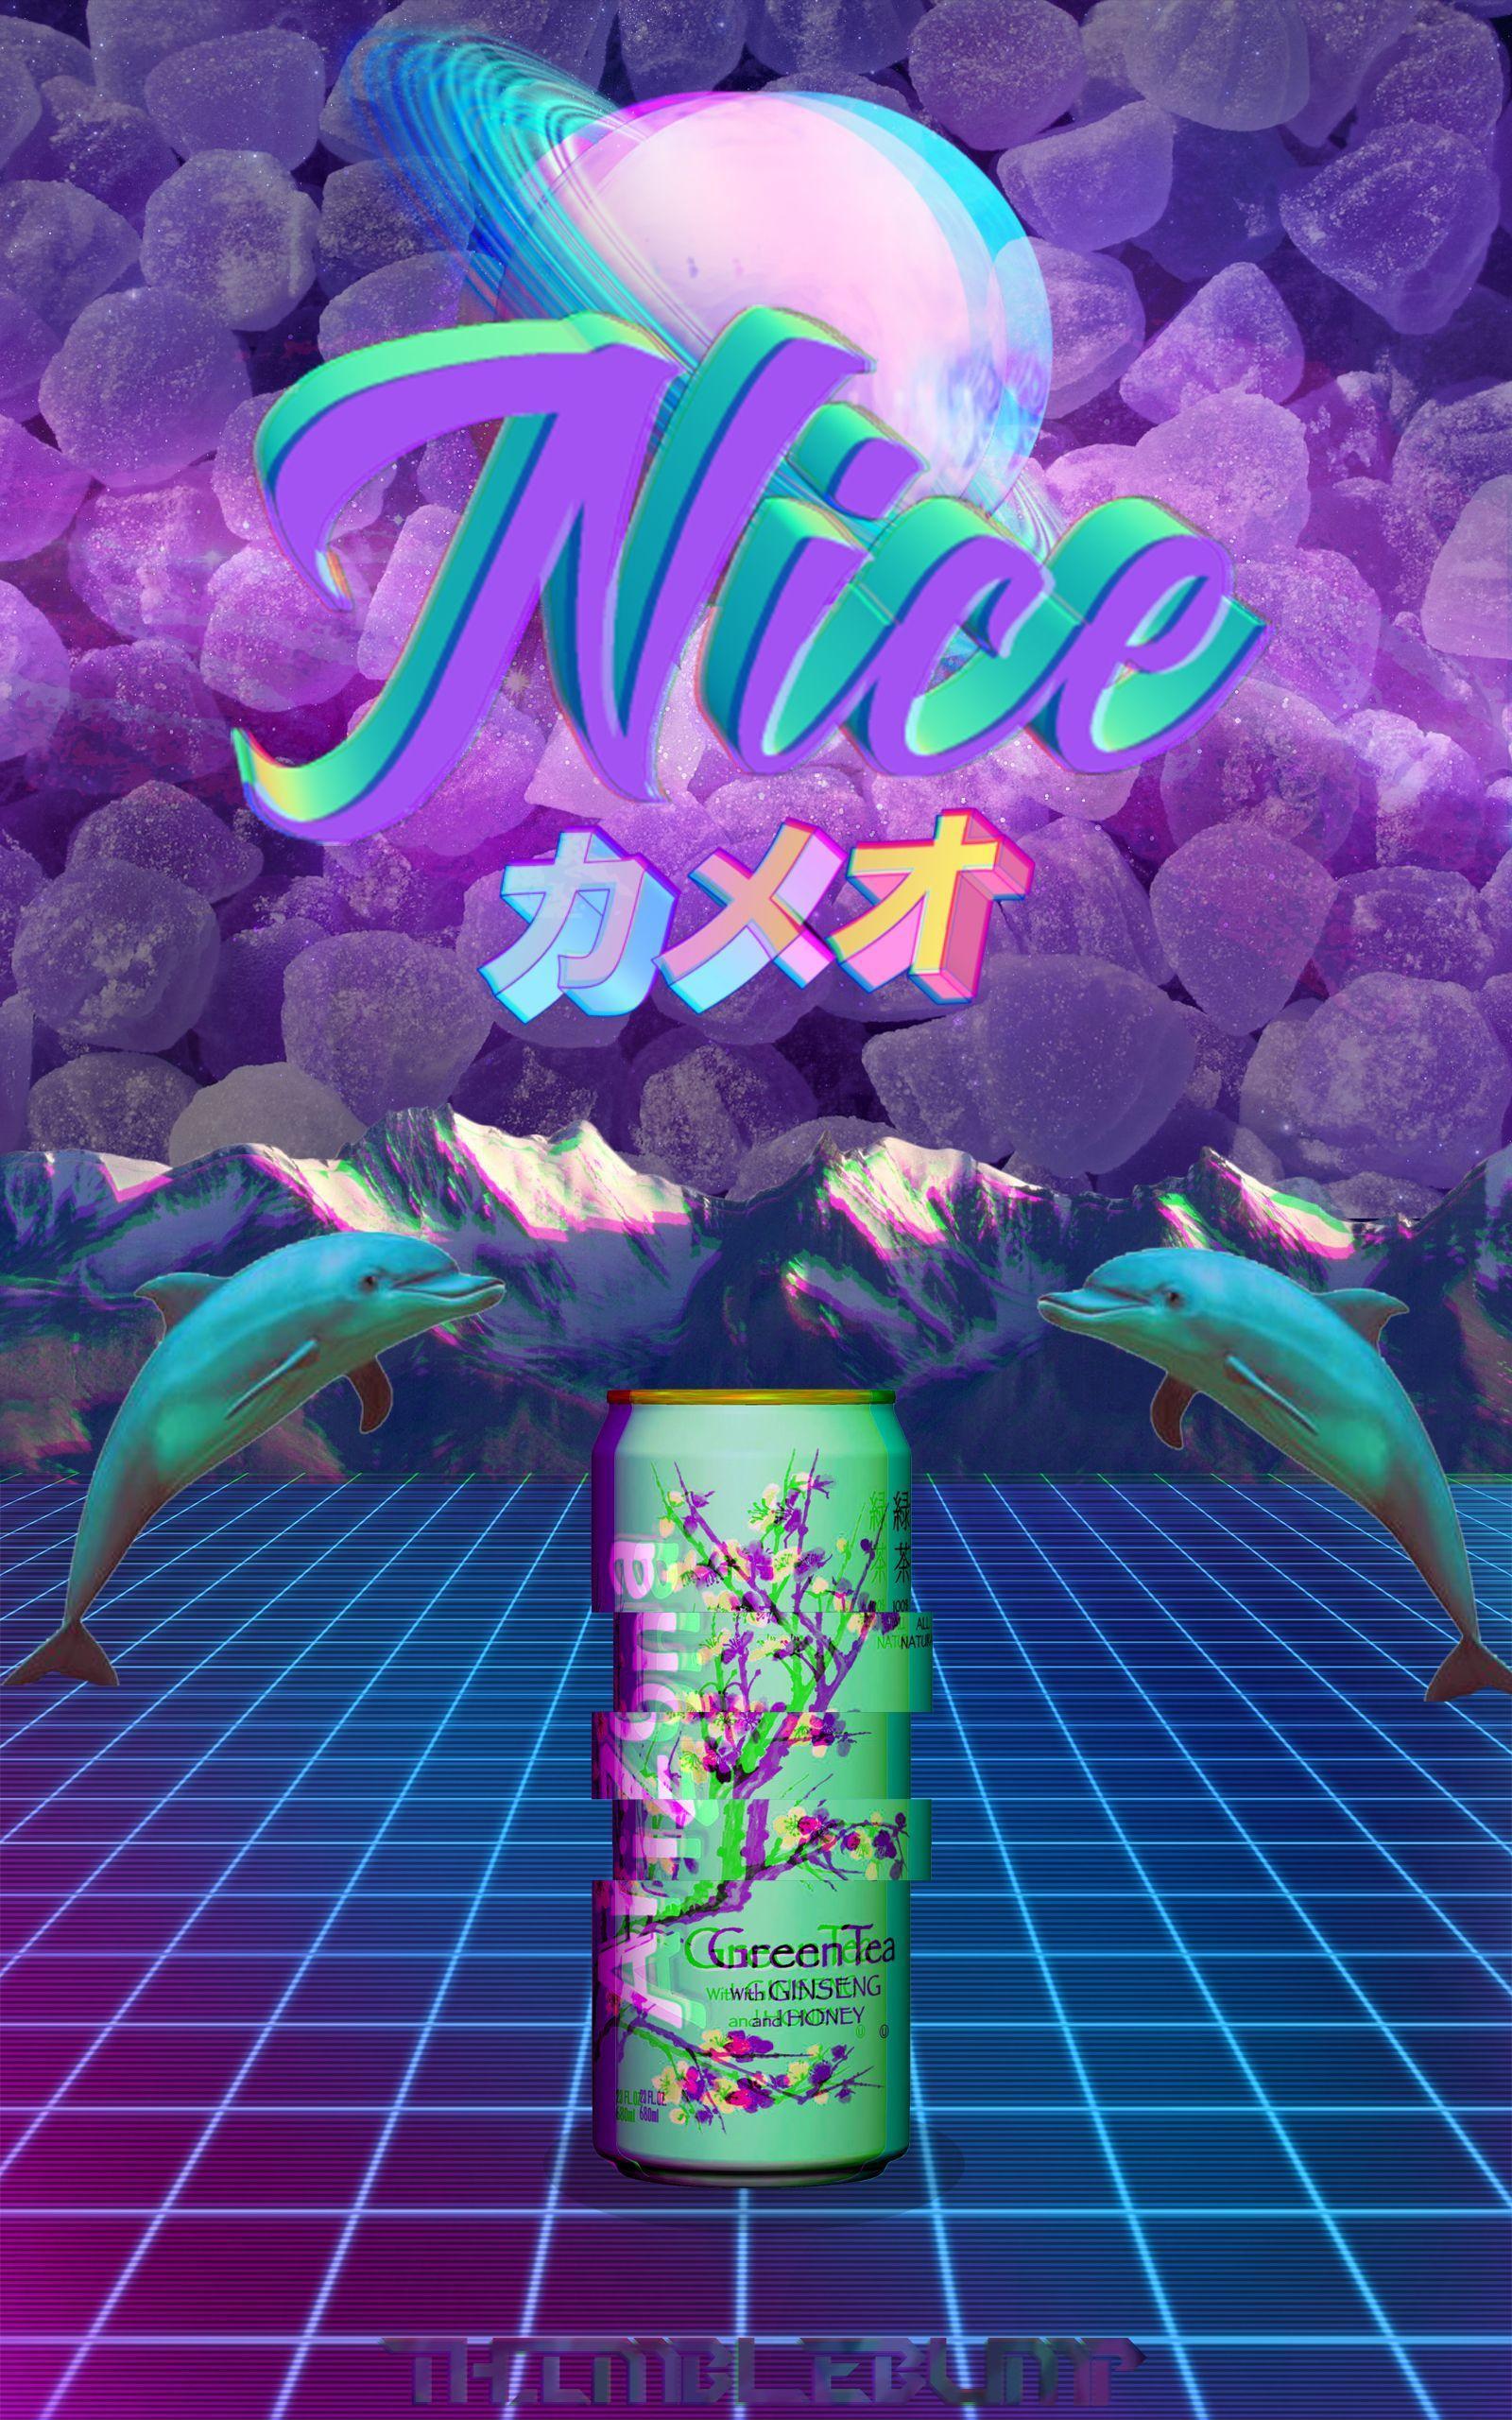 Aesthetic Meme Wallpapers Top Free Aesthetic Meme Backgrounds